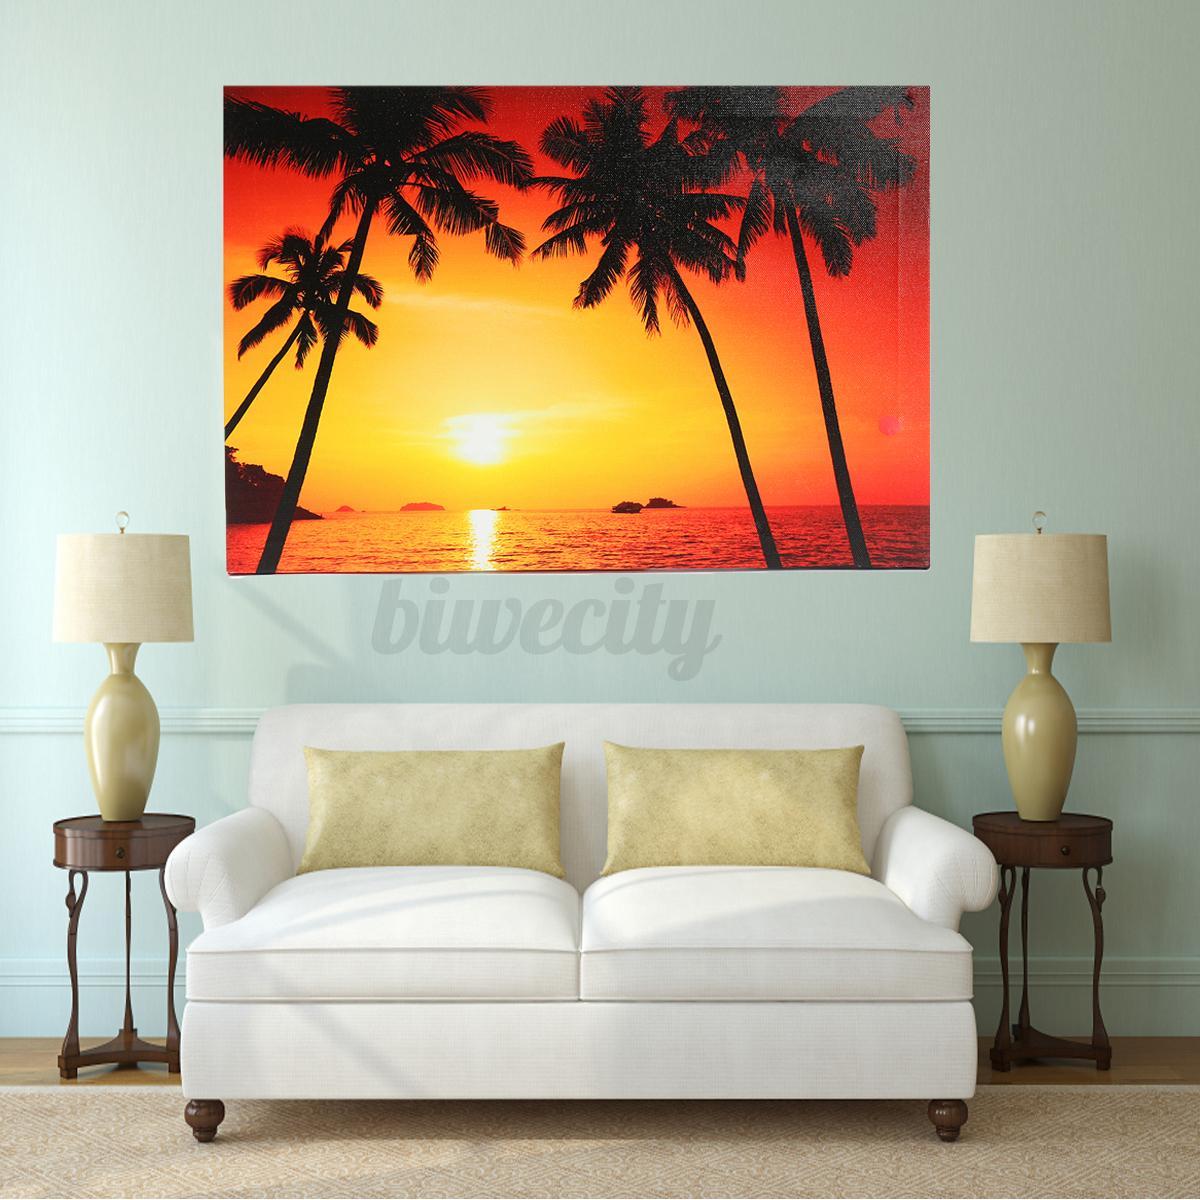 led light up sunset beach canvas print picture print wall hanging decor framed ebay. Black Bedroom Furniture Sets. Home Design Ideas